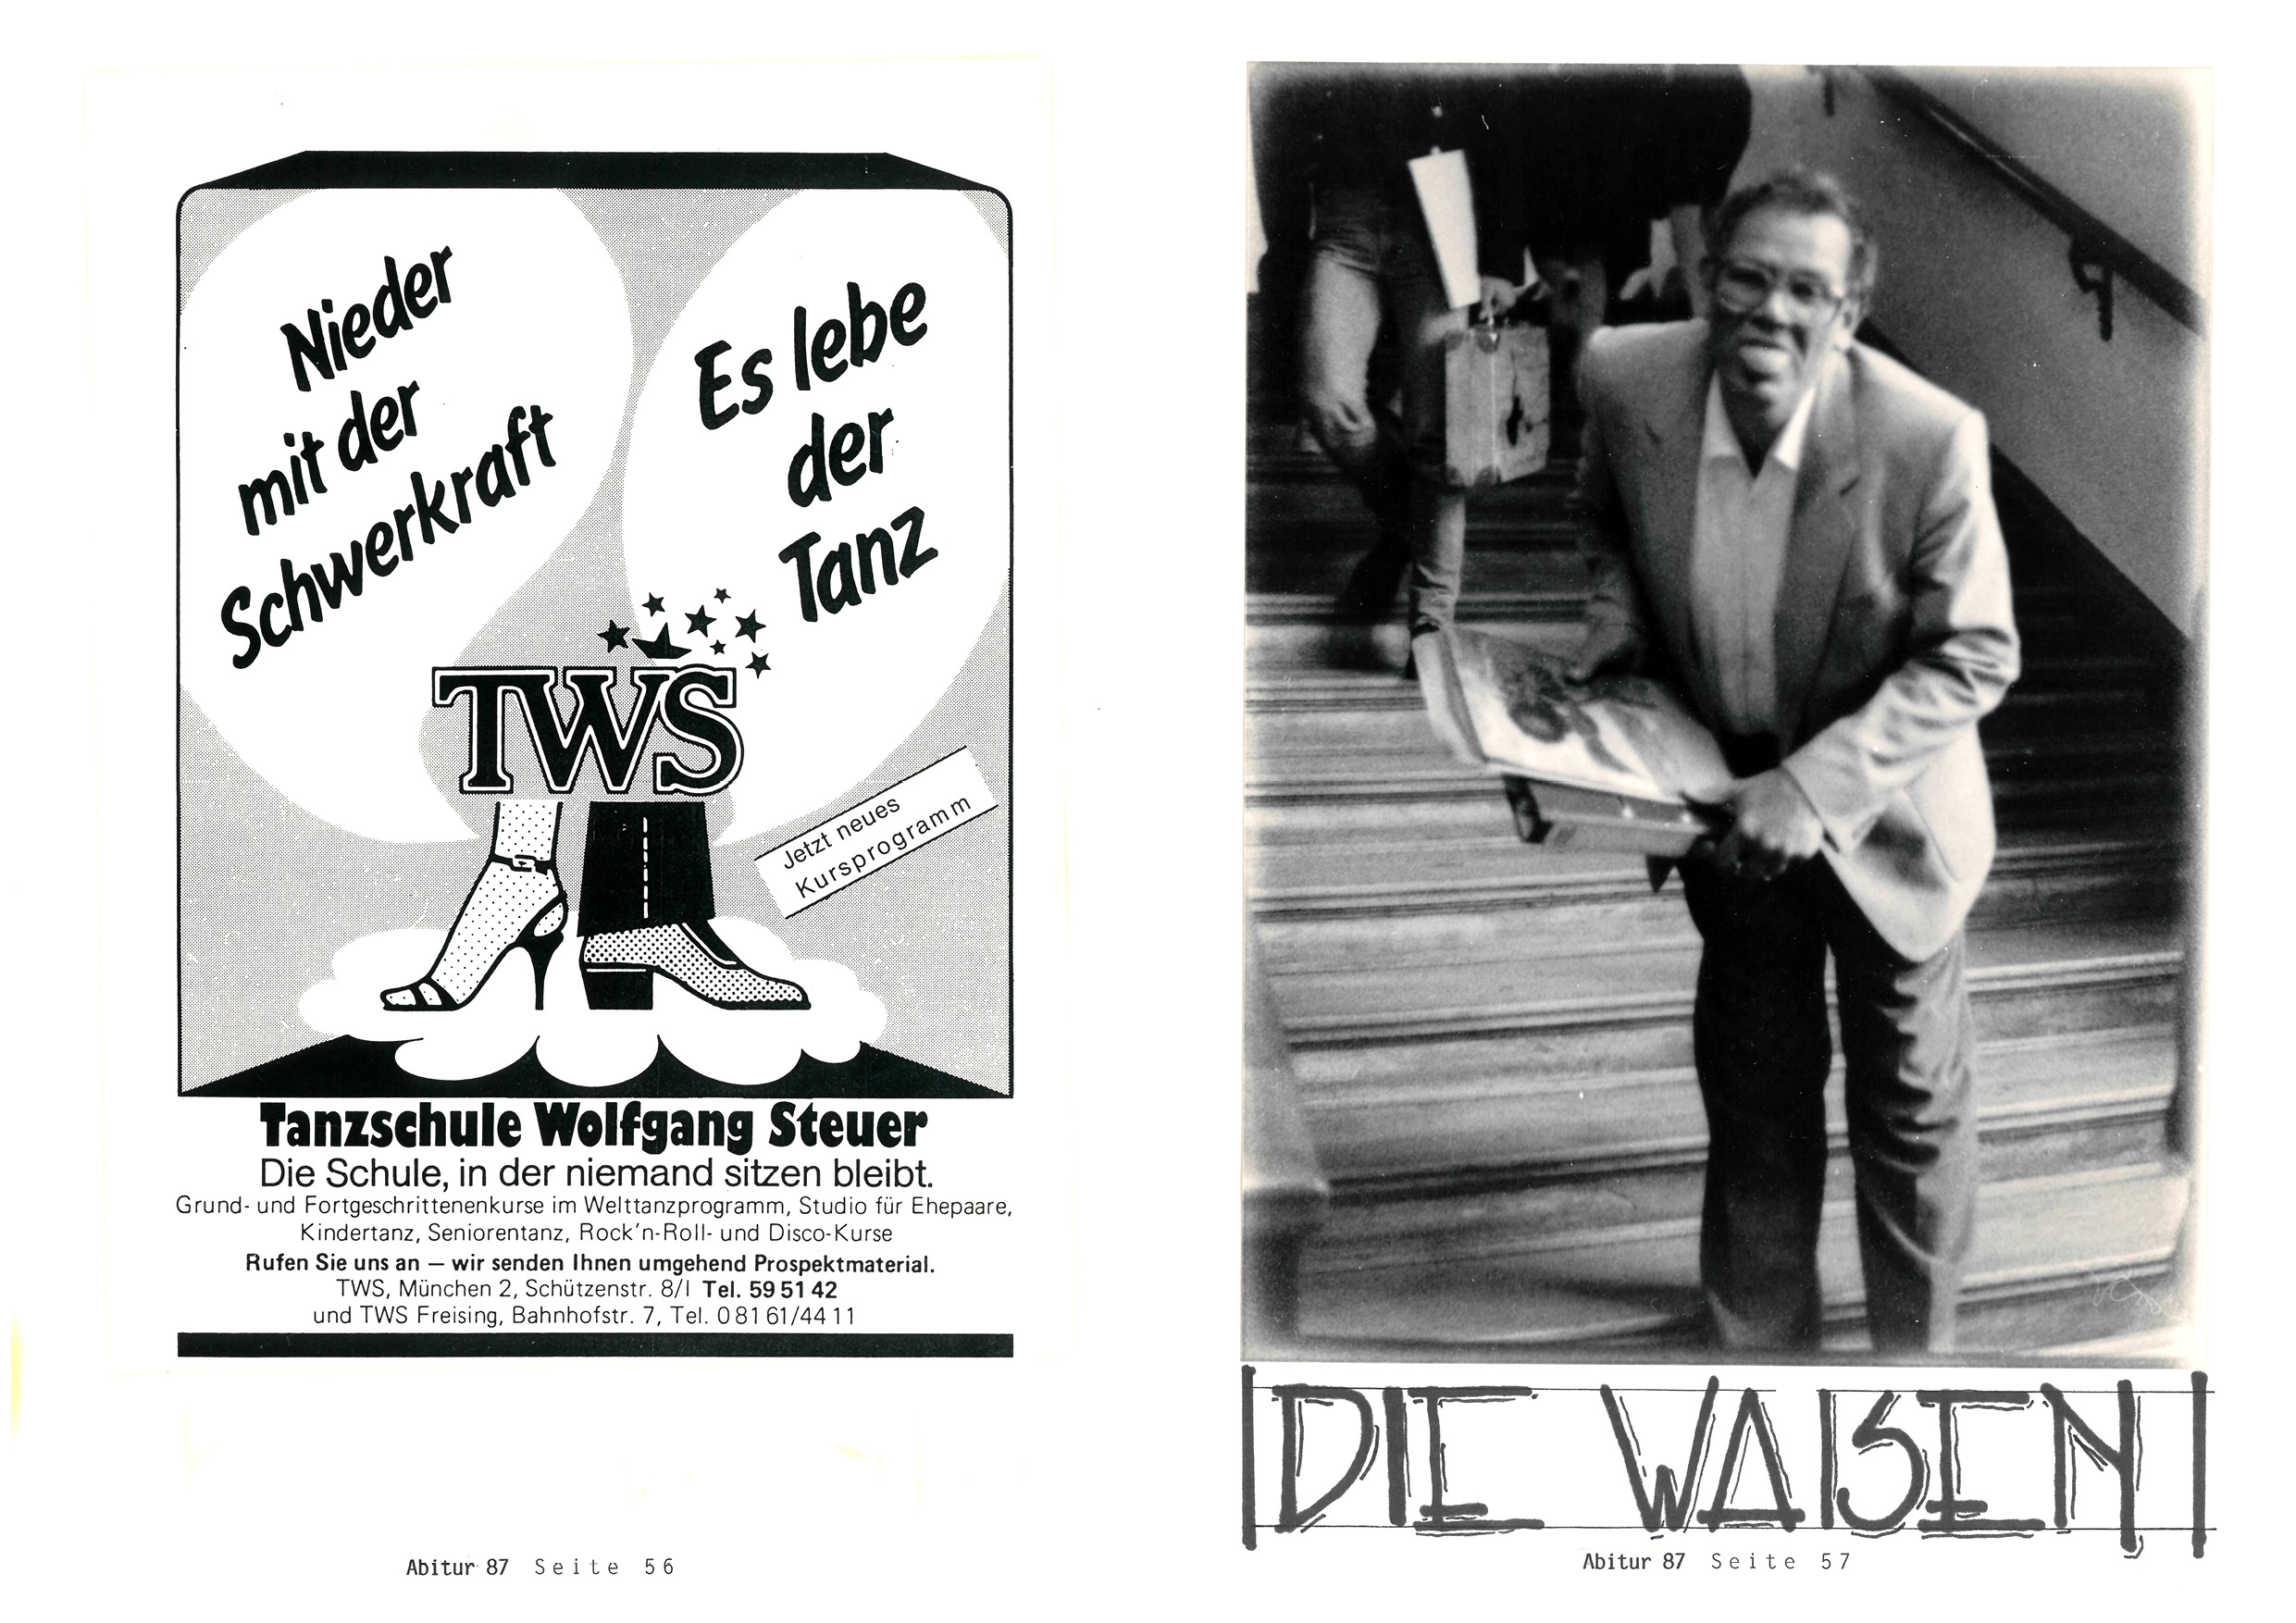 Abiturzeitung198730